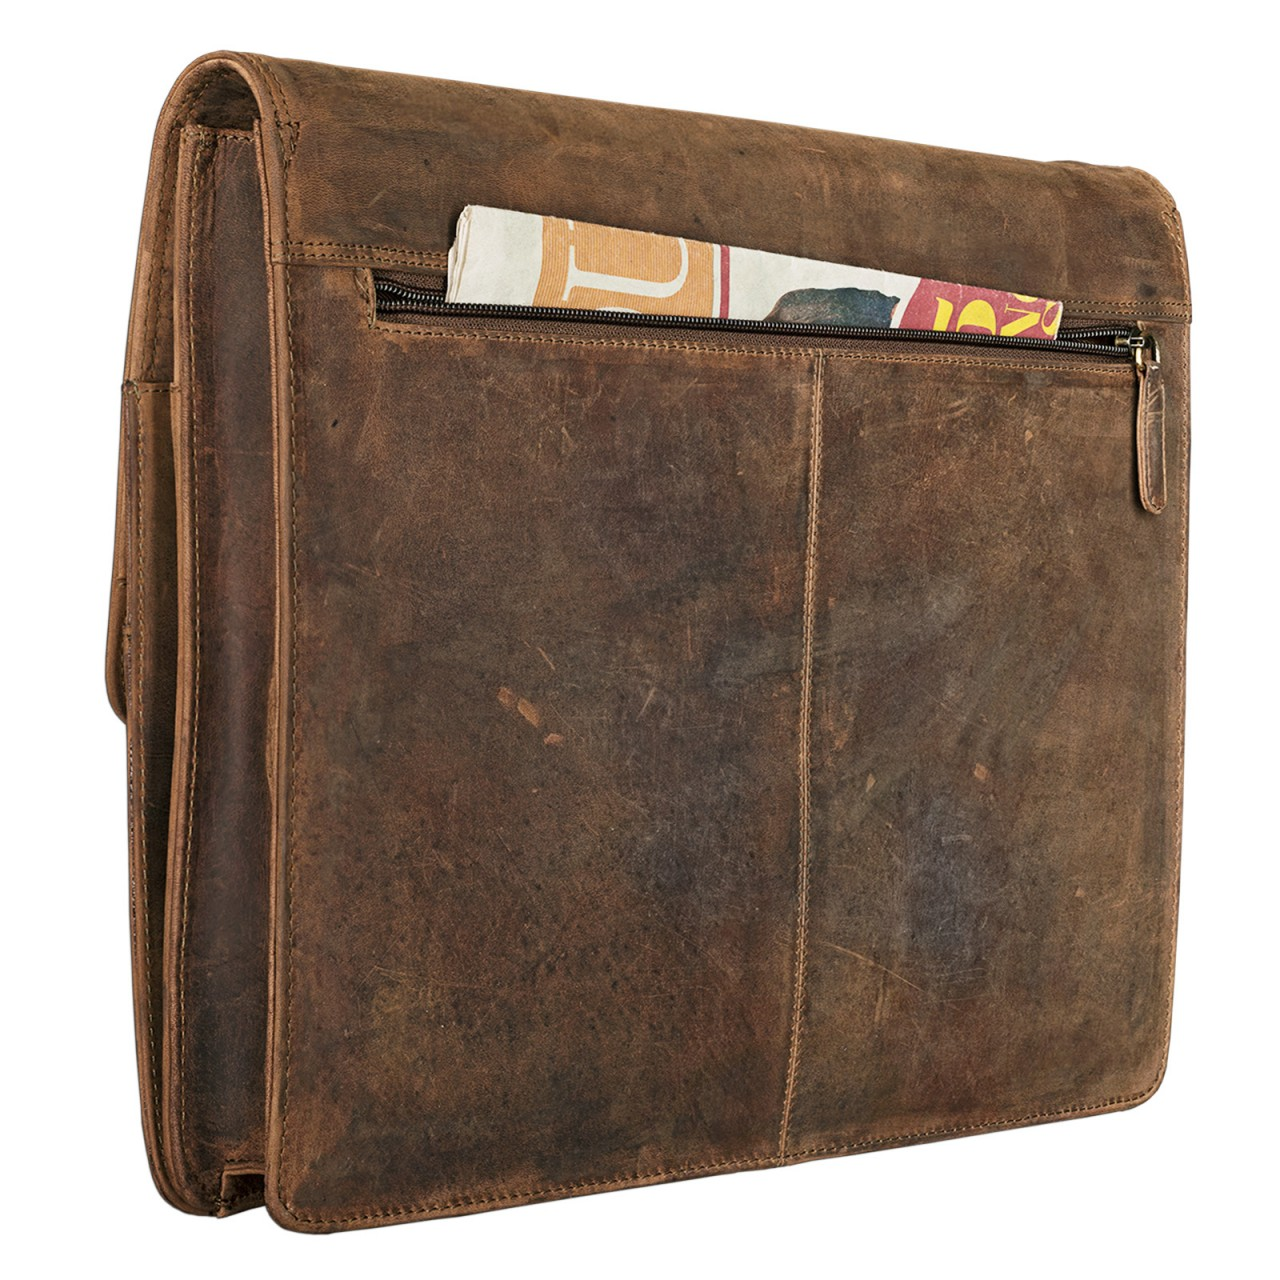 "STILORD ""Magnus"" Vintage Konferenzmappe Leder A4 Aktenmappe Aktentasche Dokumentenmappe für 13,3 Zoll MacBooks echtes Rindsleder - Bild 13"